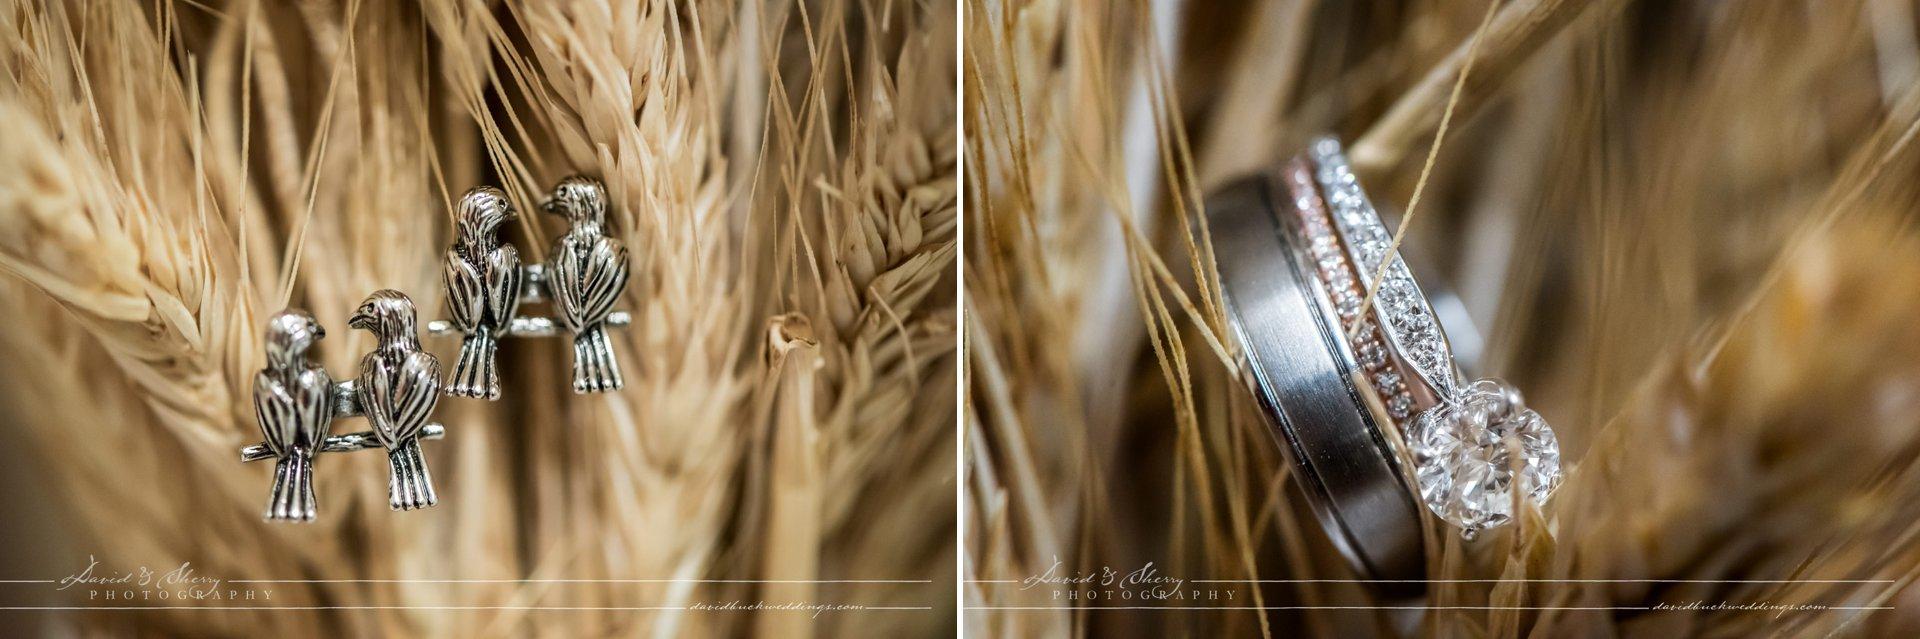 waterstone-estate-wedding-david-sherry-photography-simon-crystal-002